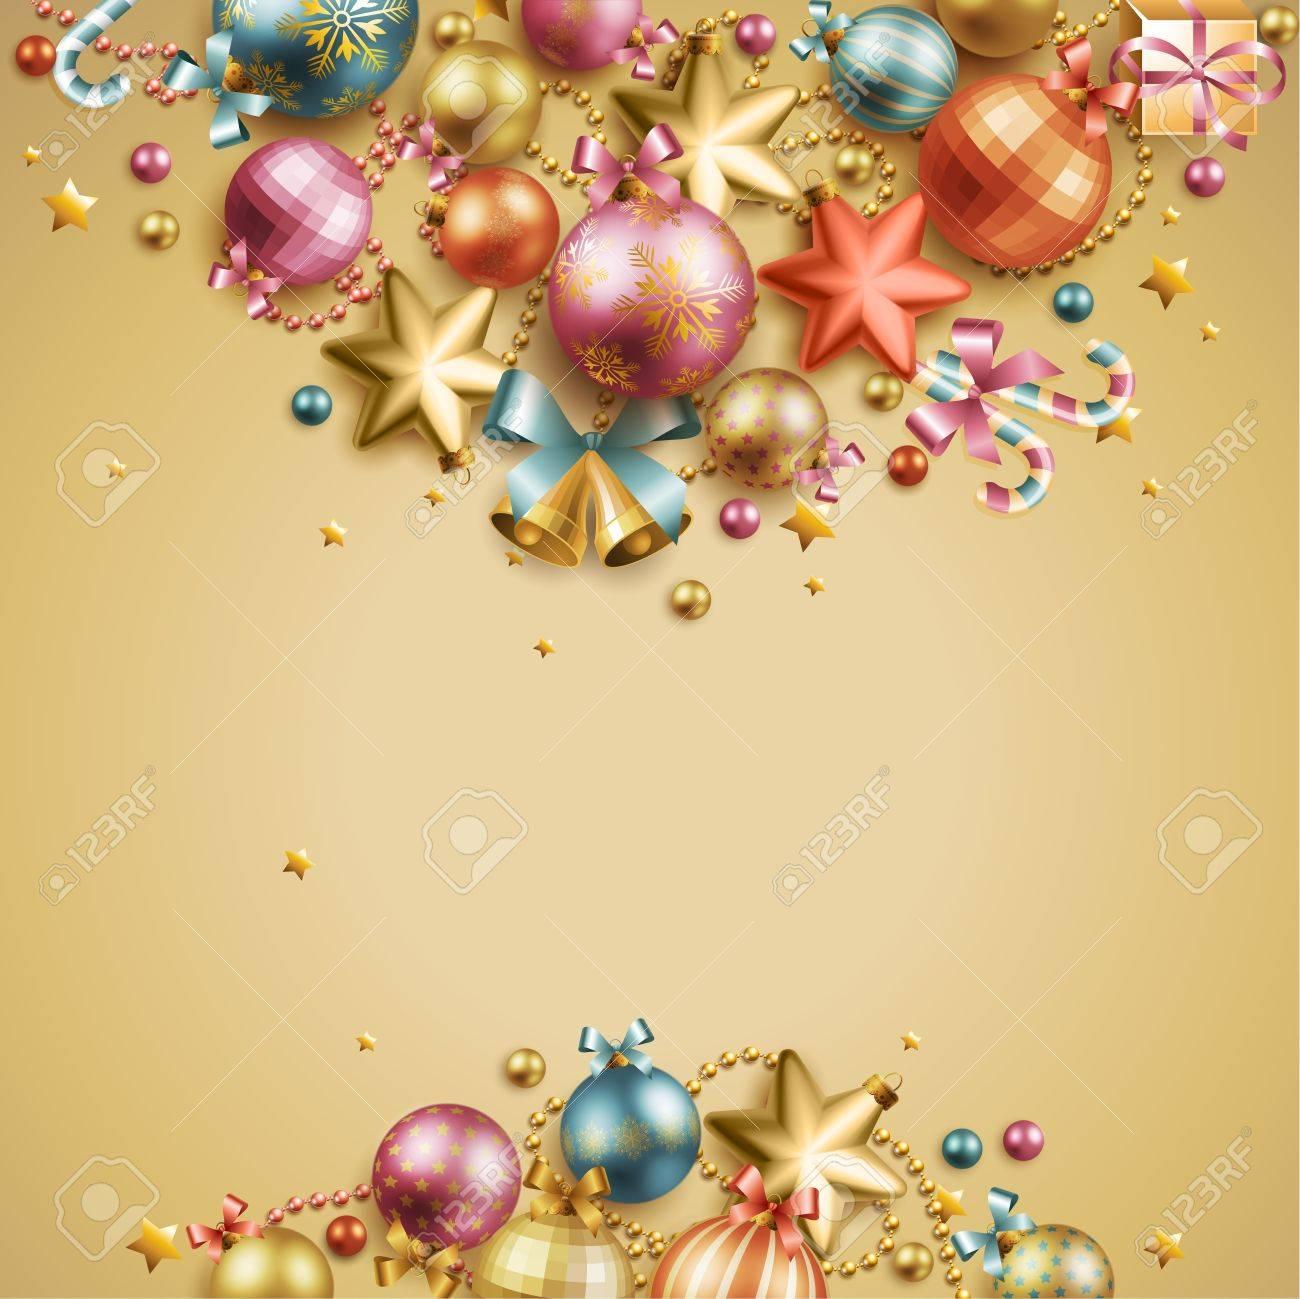 Christmas vintage background. Vector illustration. Stock Vector - 11656295